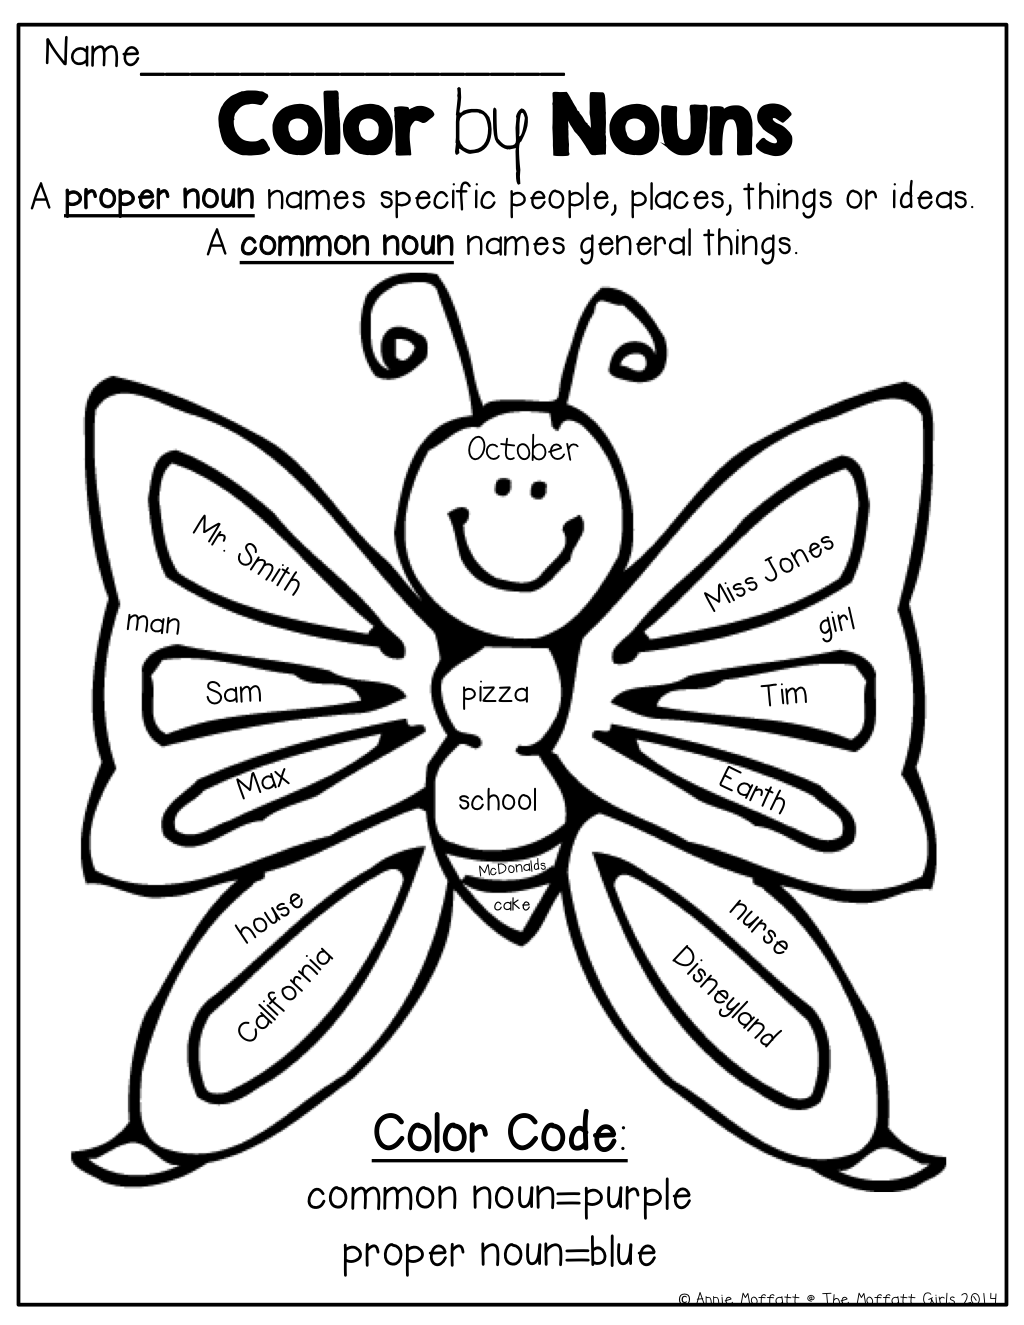 Spring Math and Literacy Packet NO PREP (1st Grade) | Proper nouns ...